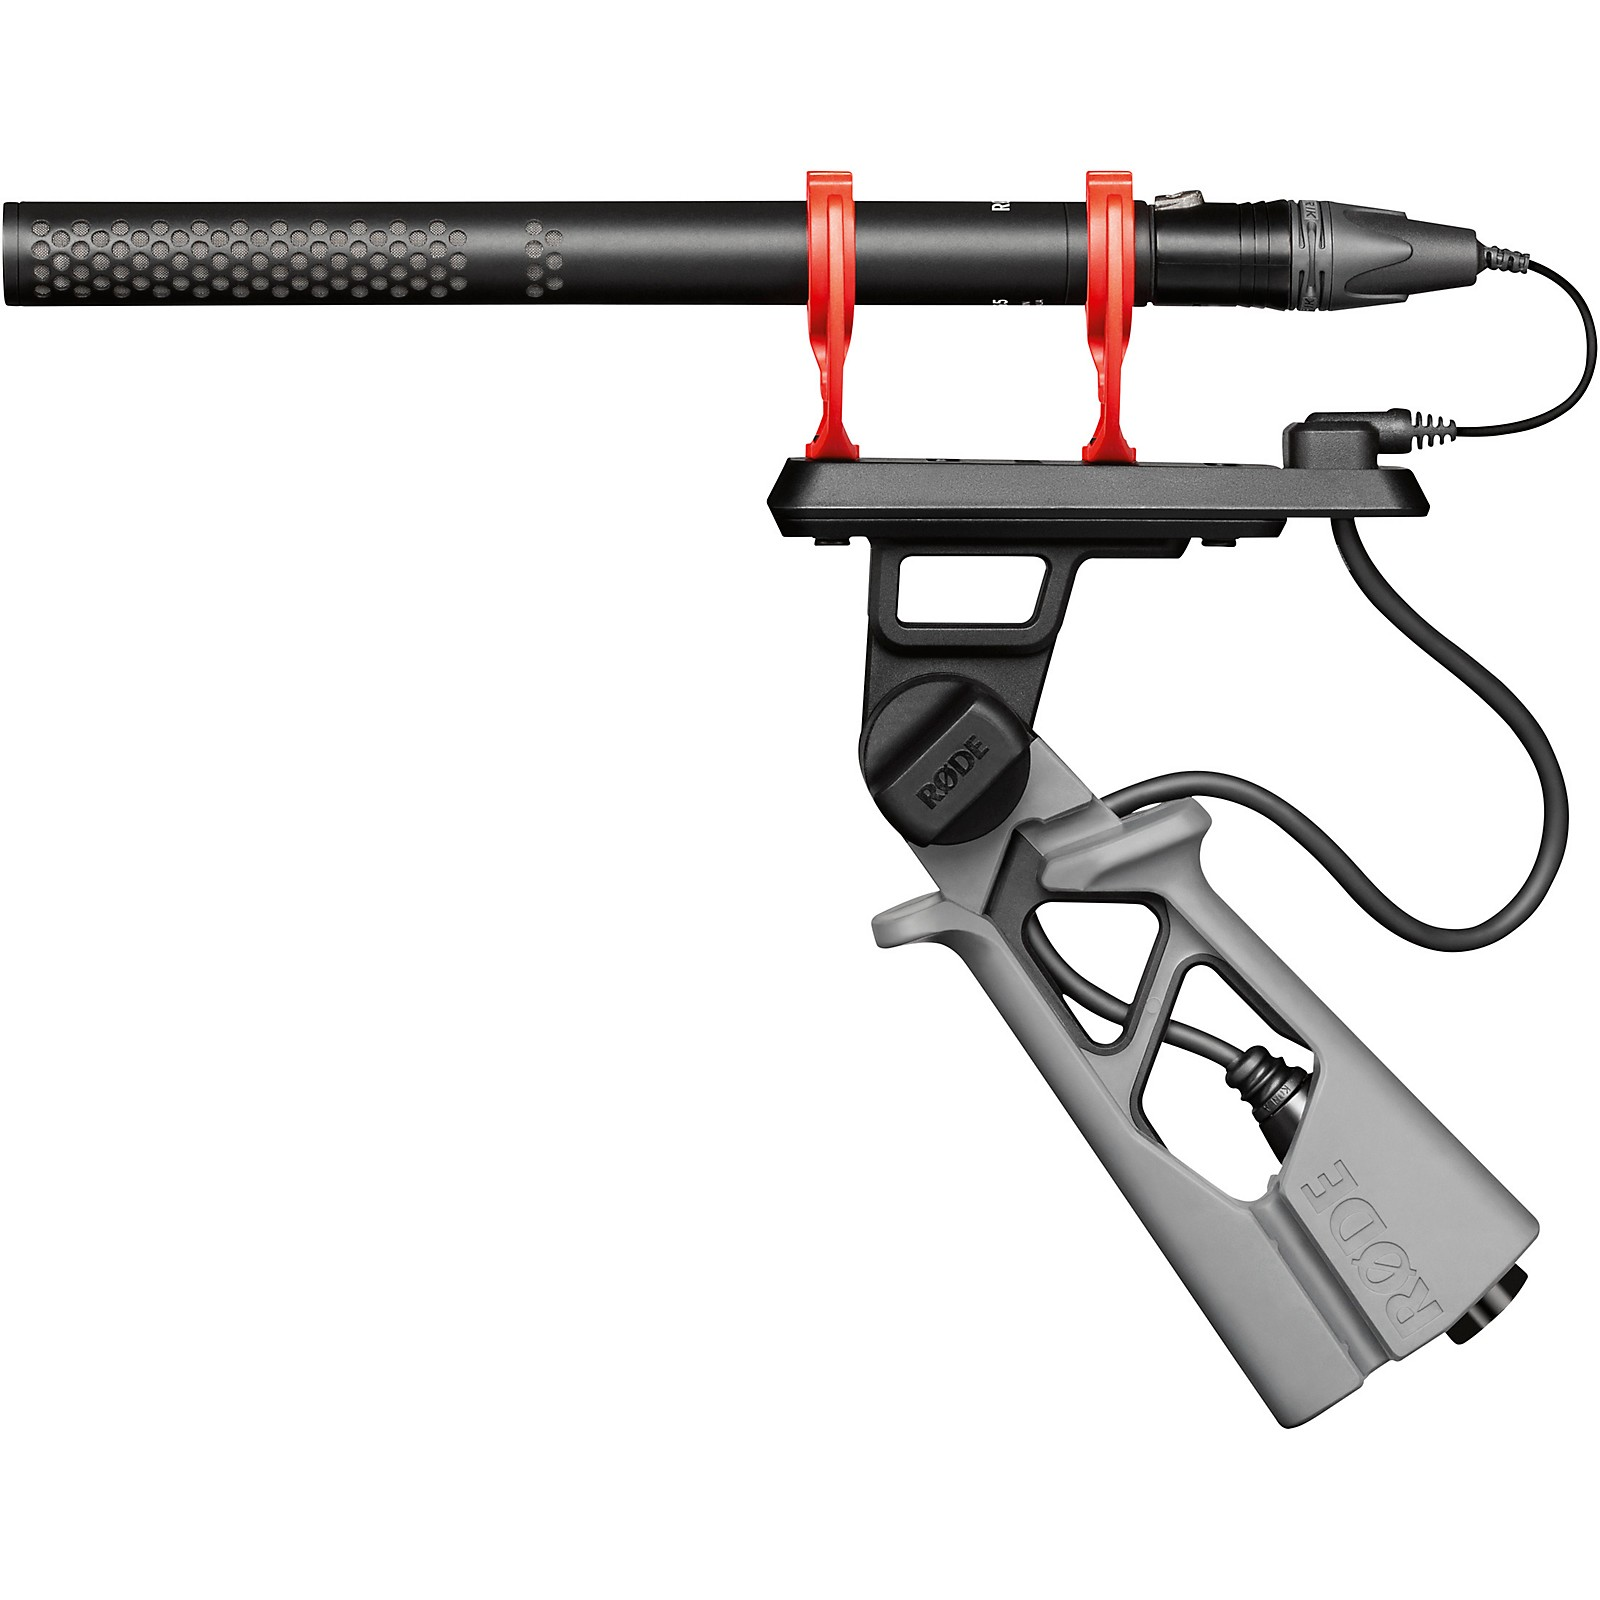 Rode NTG5 Shotgun Microphone